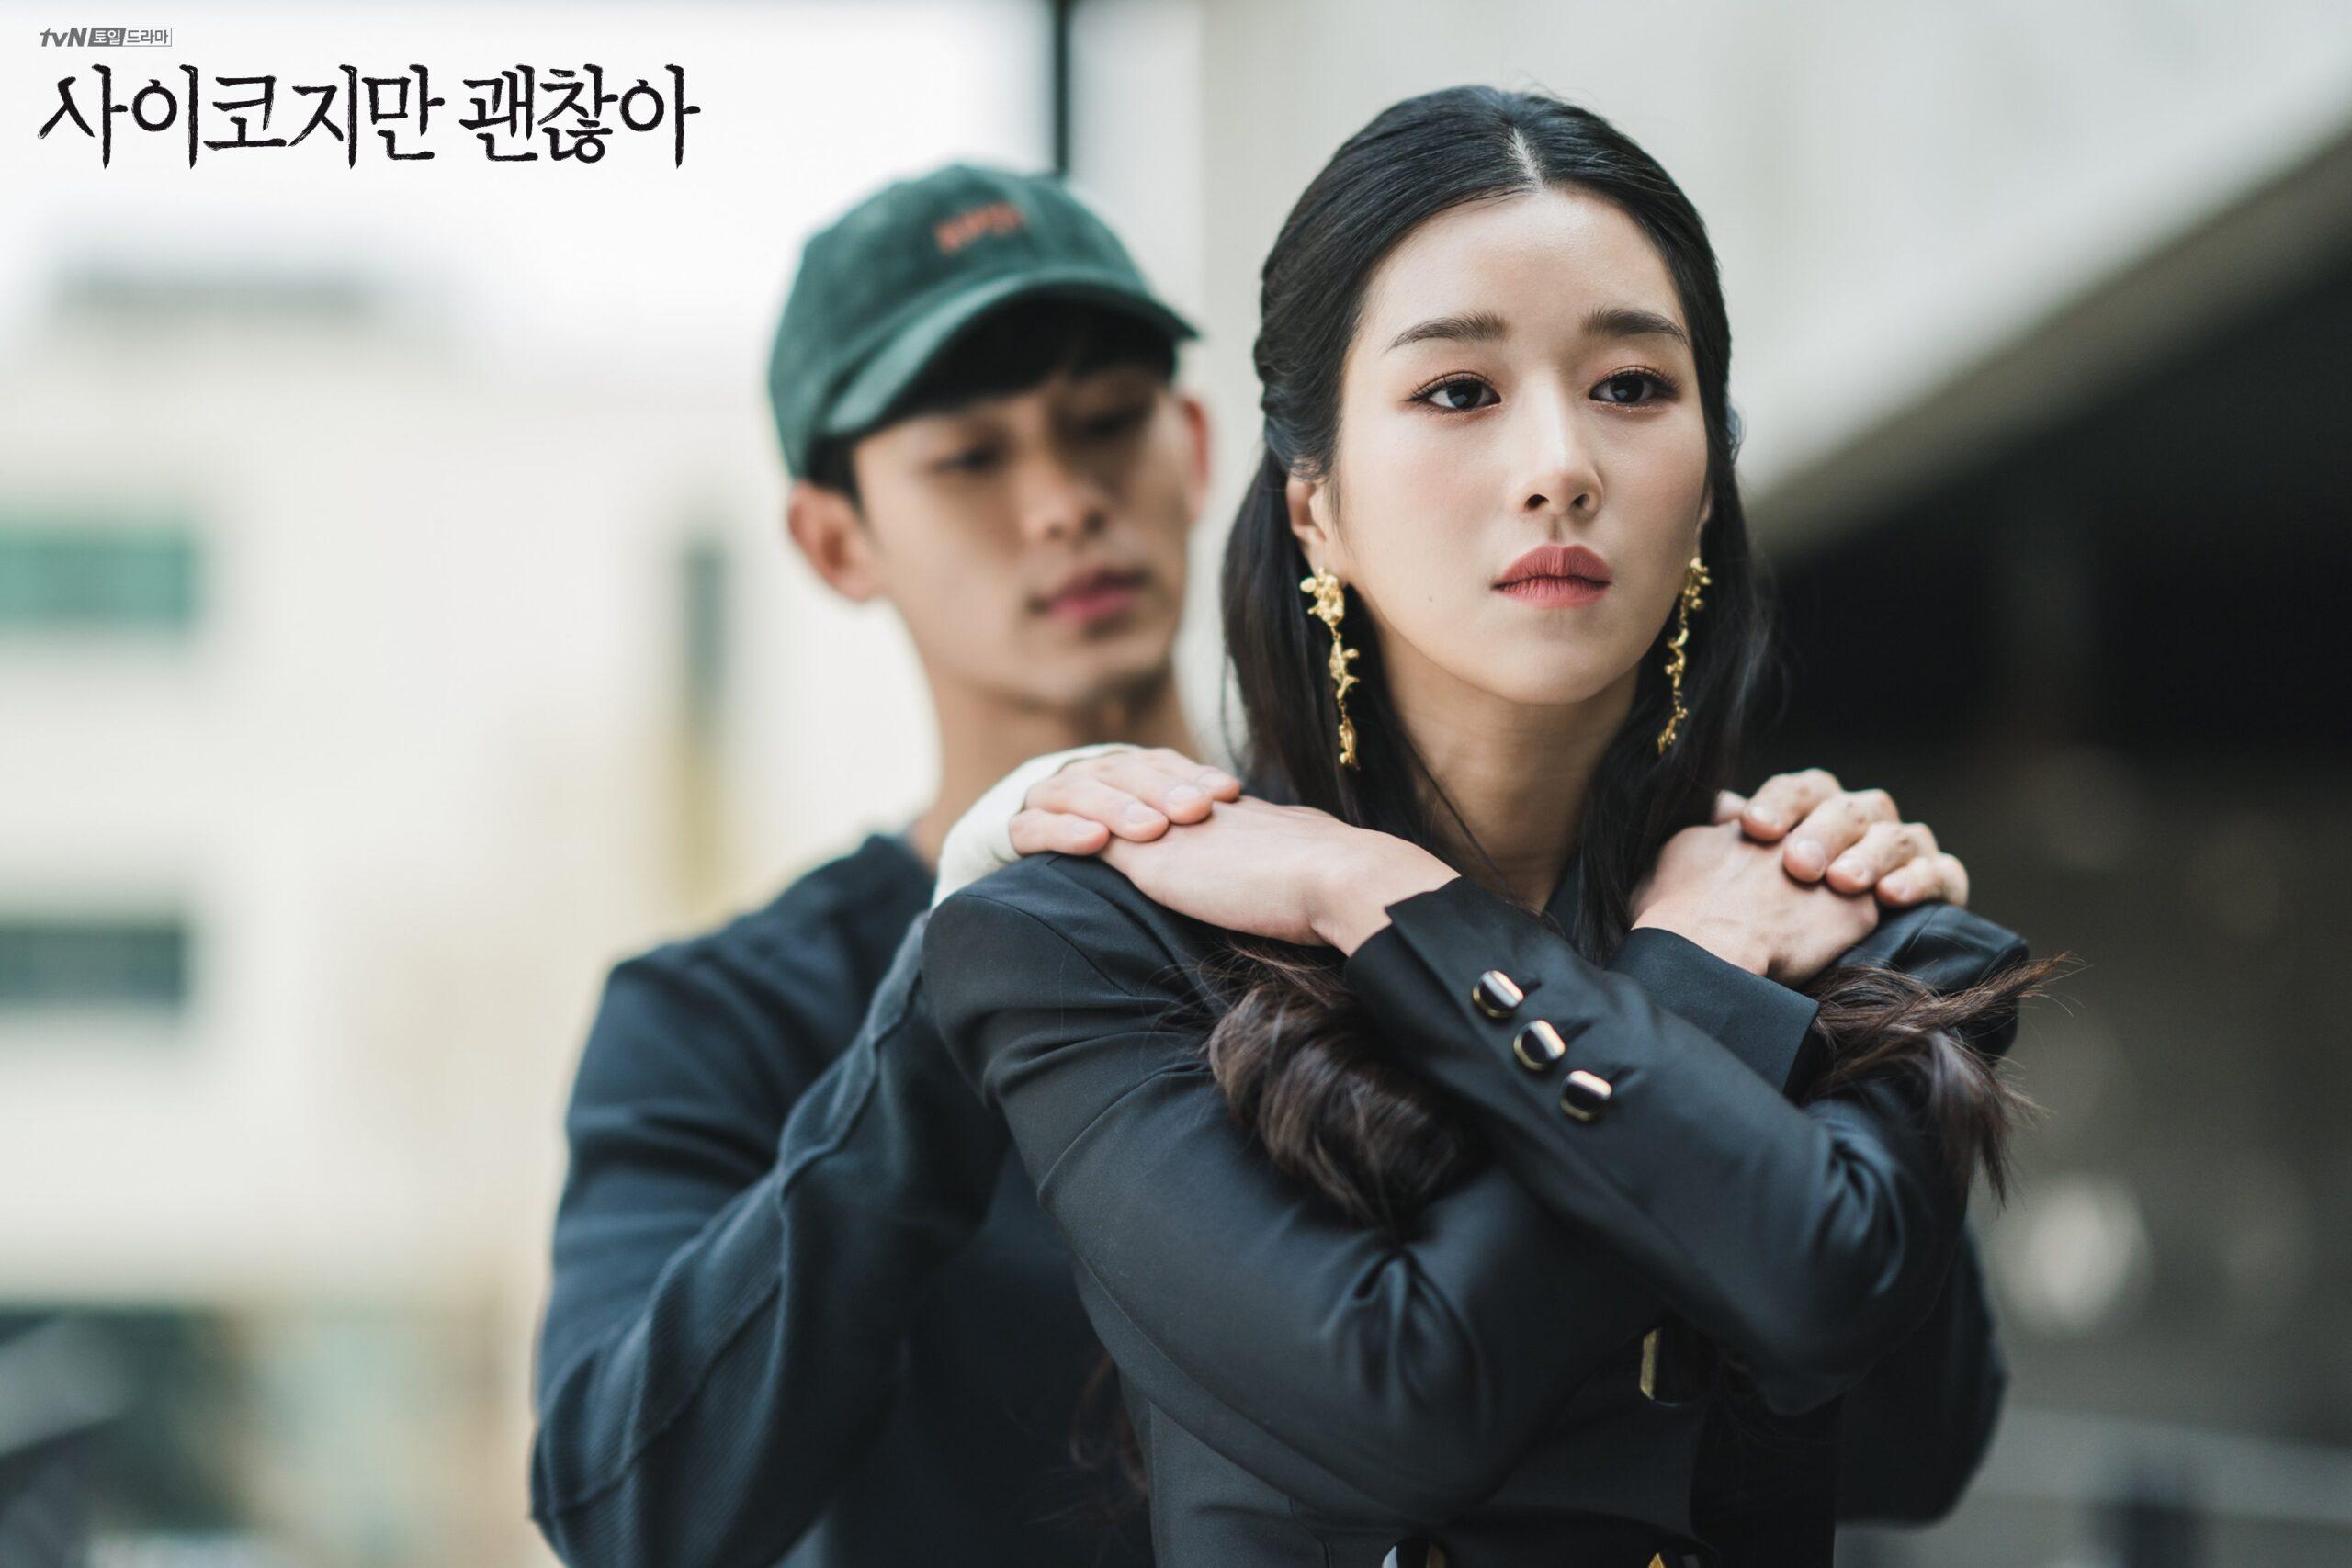 Go Mun-Yeong et Mun Gang-Tae